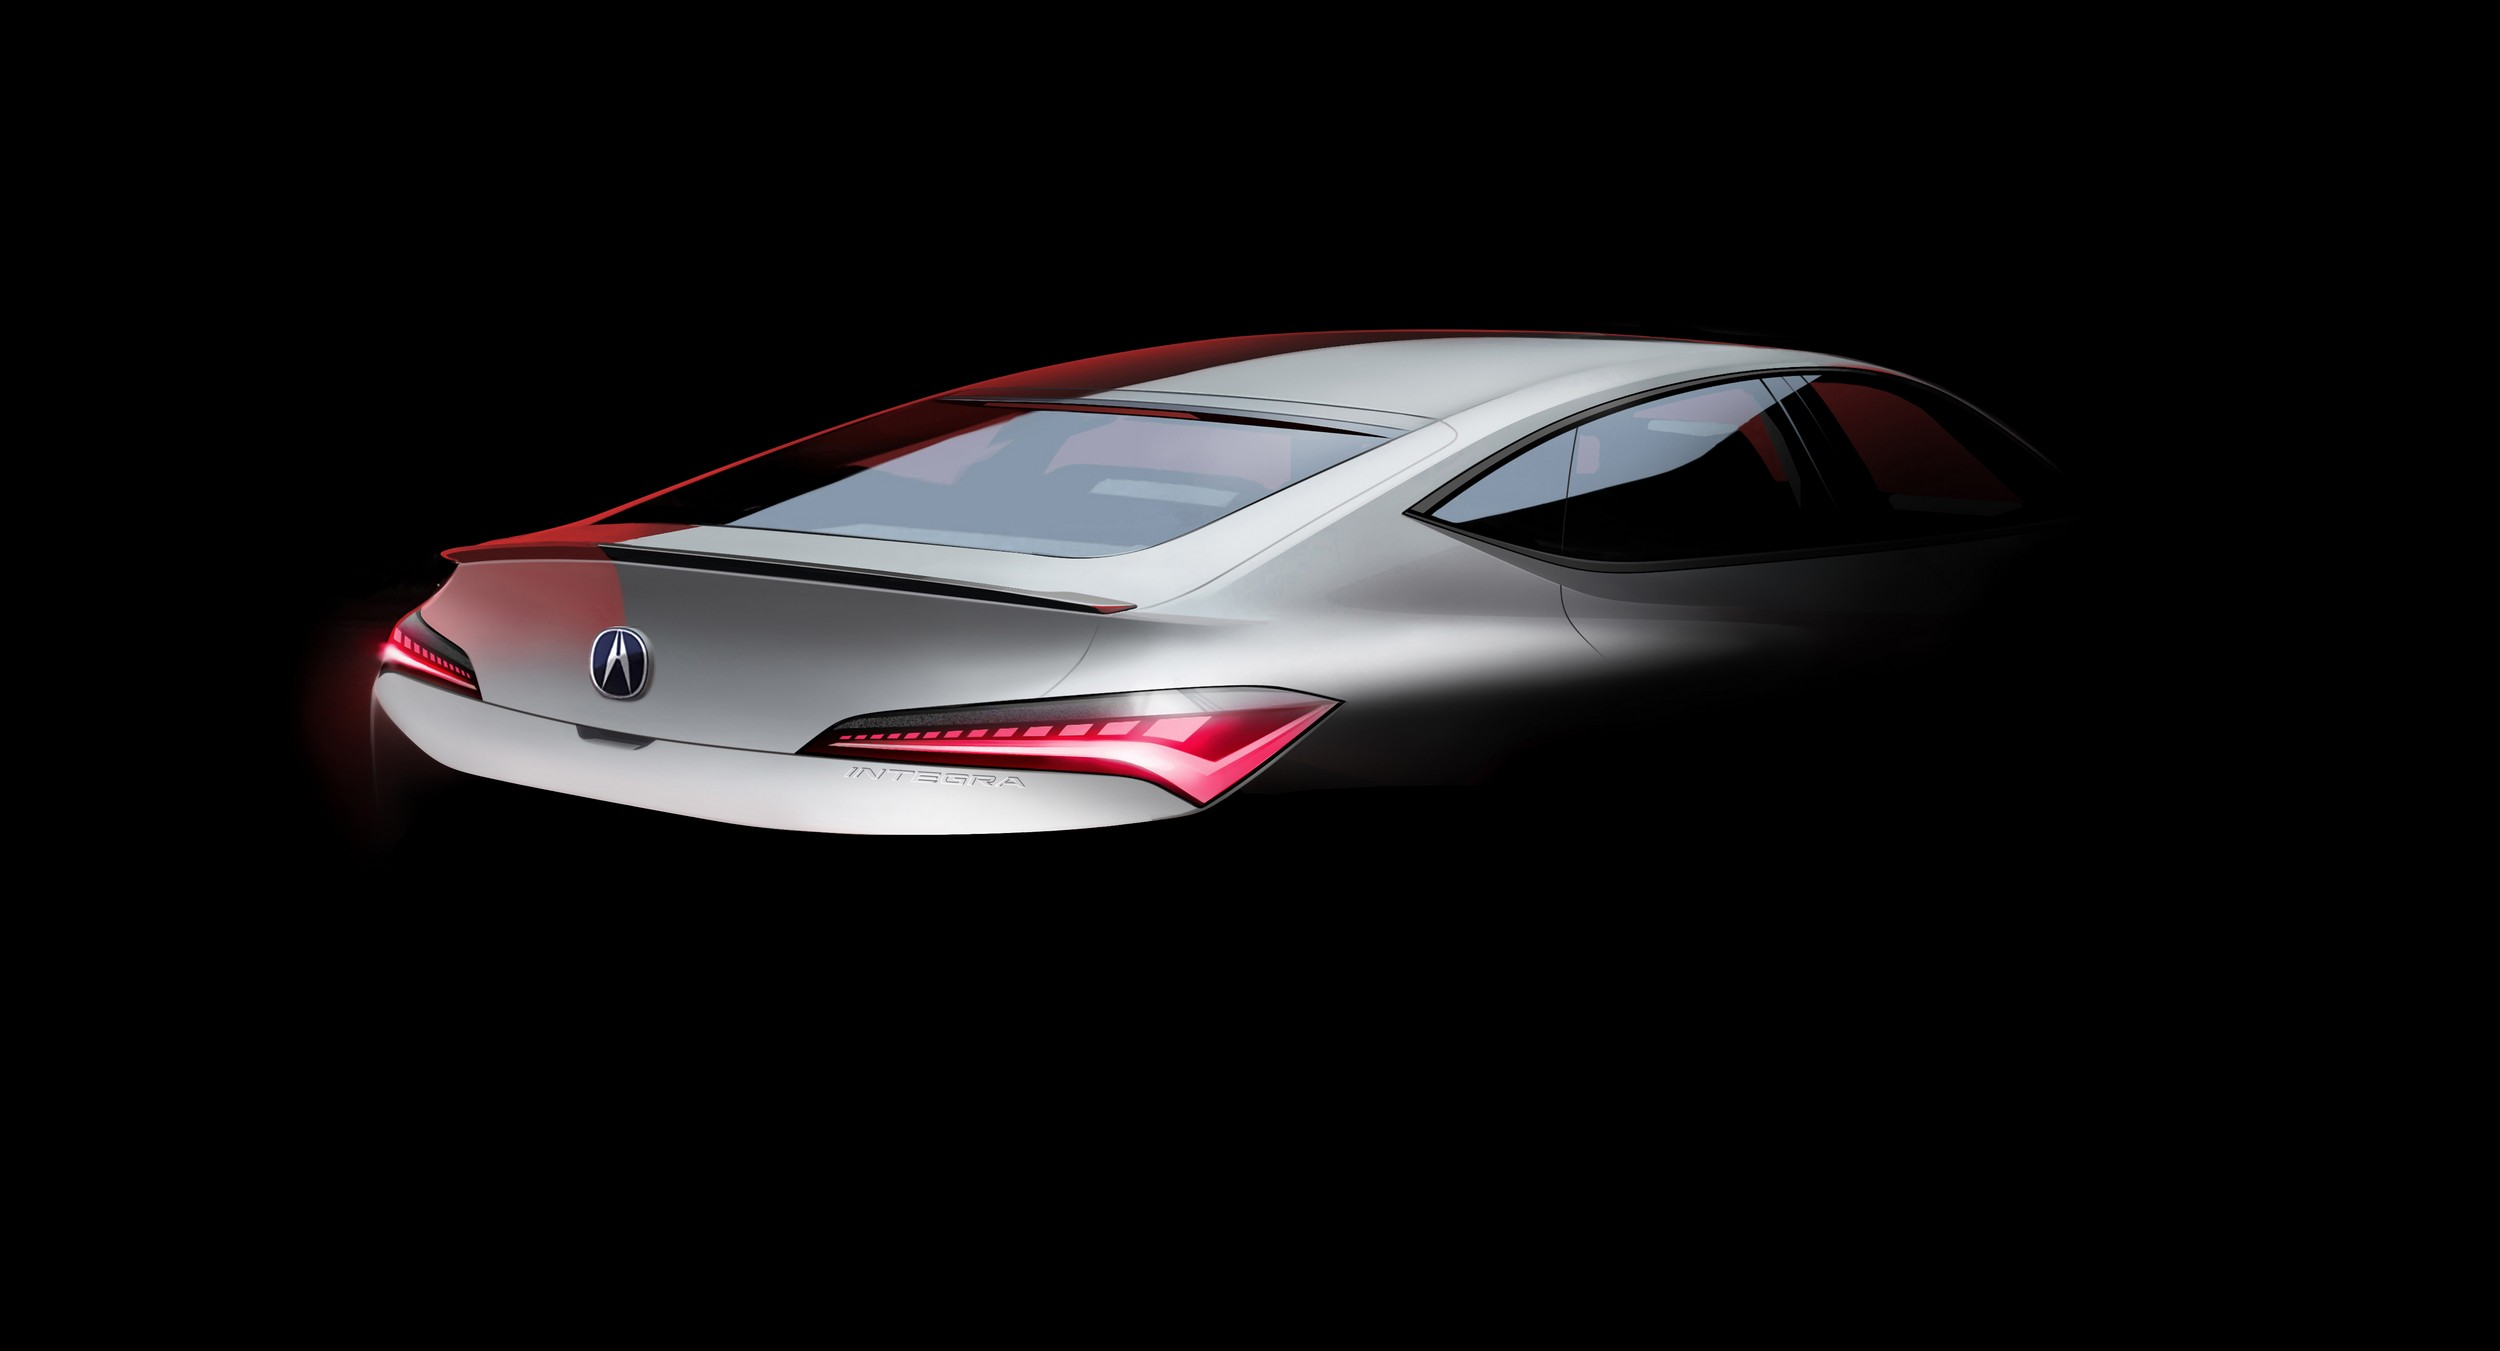 2022 Acura Integra